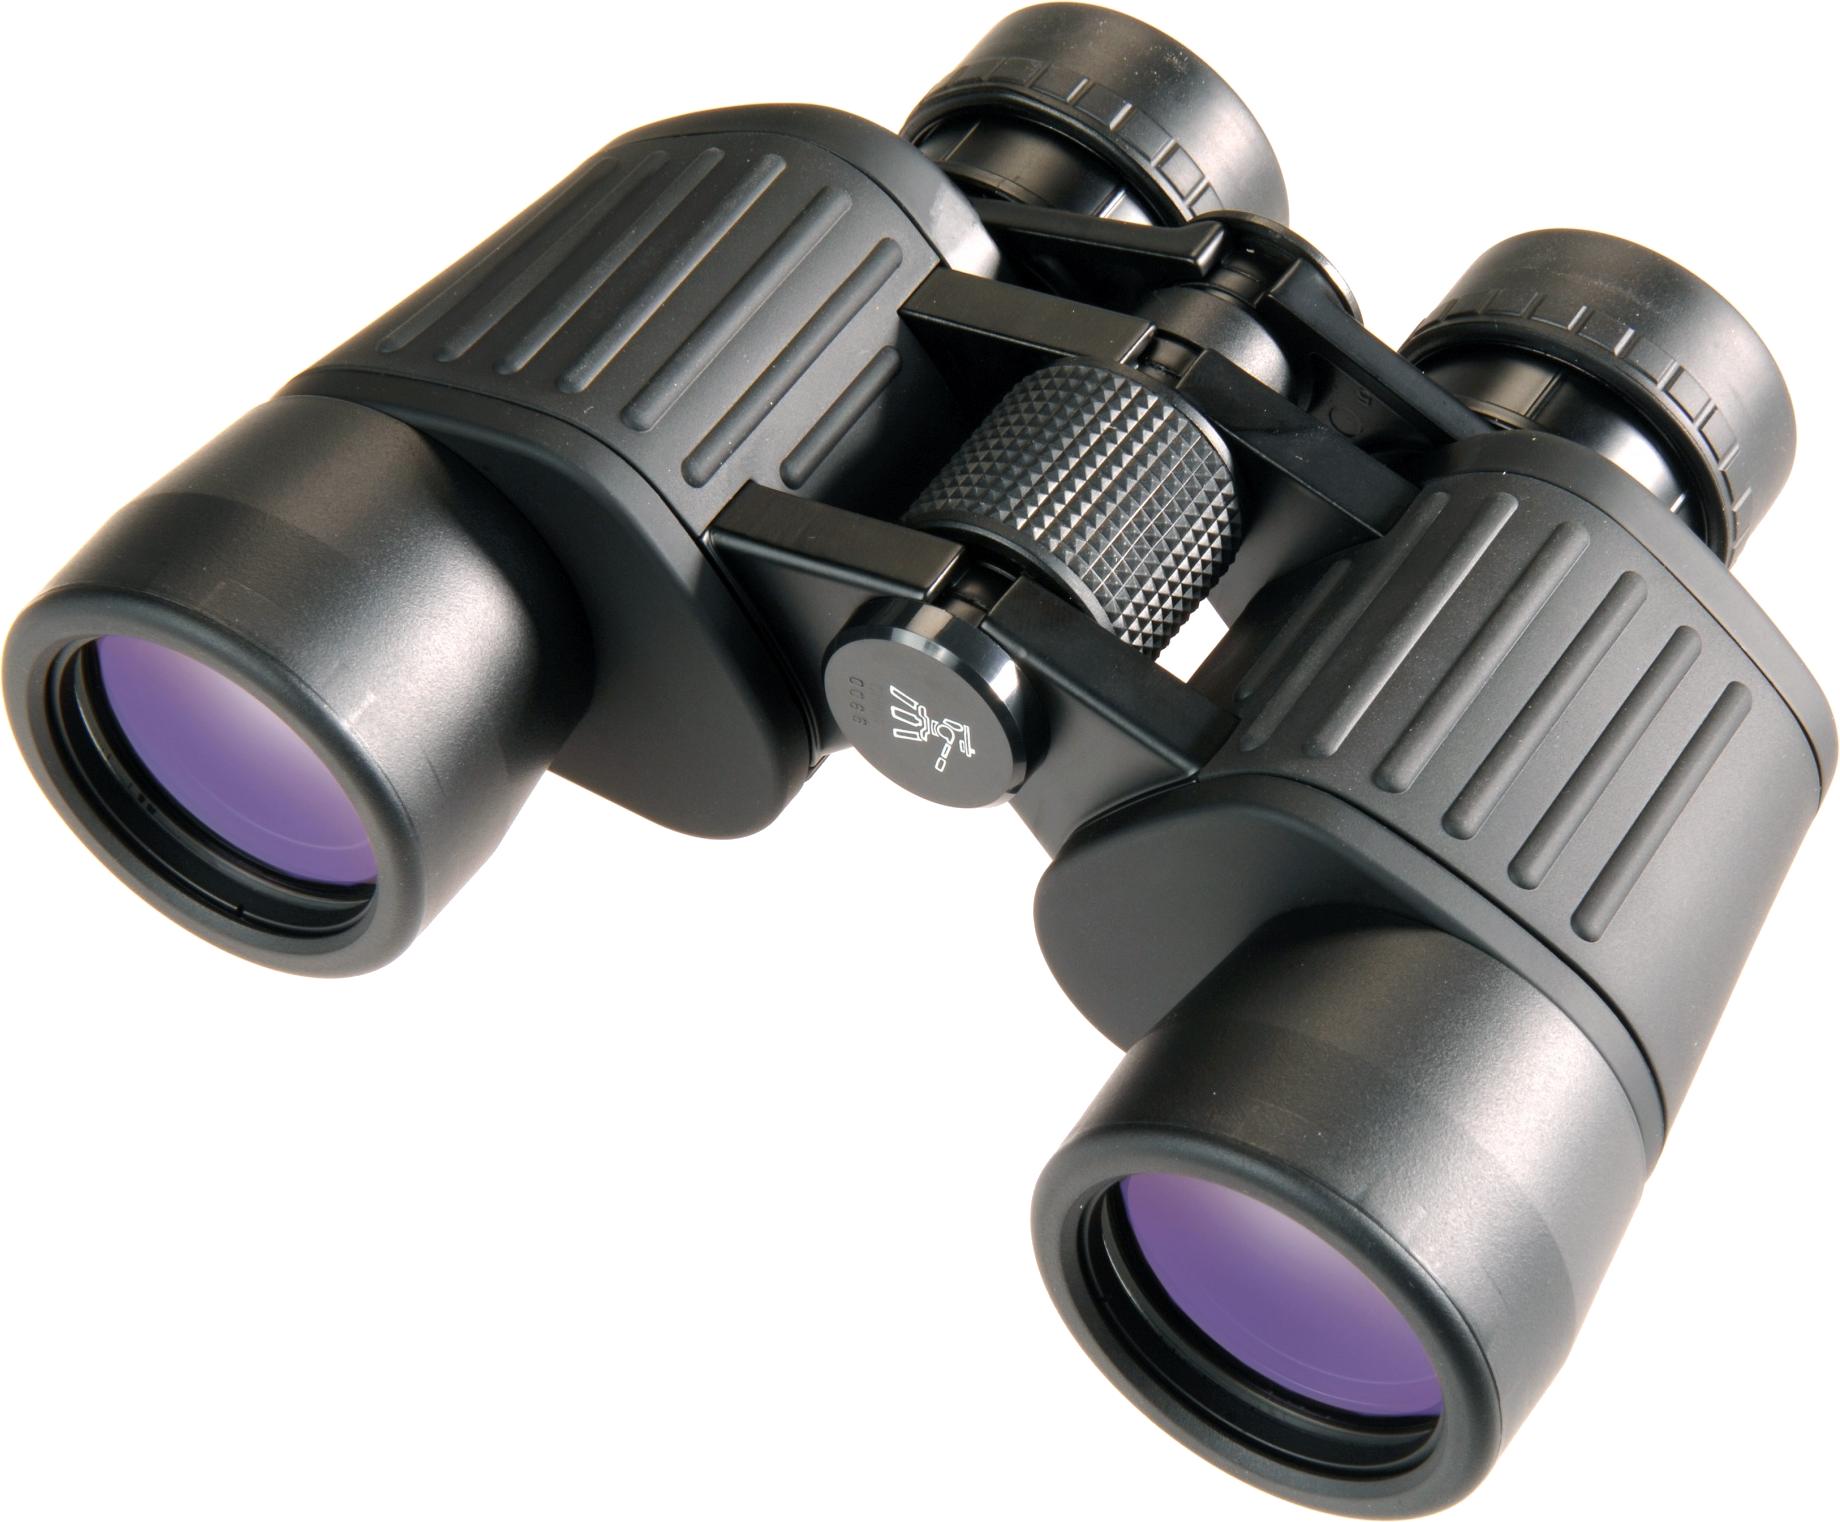 binoculars view png - photo #9